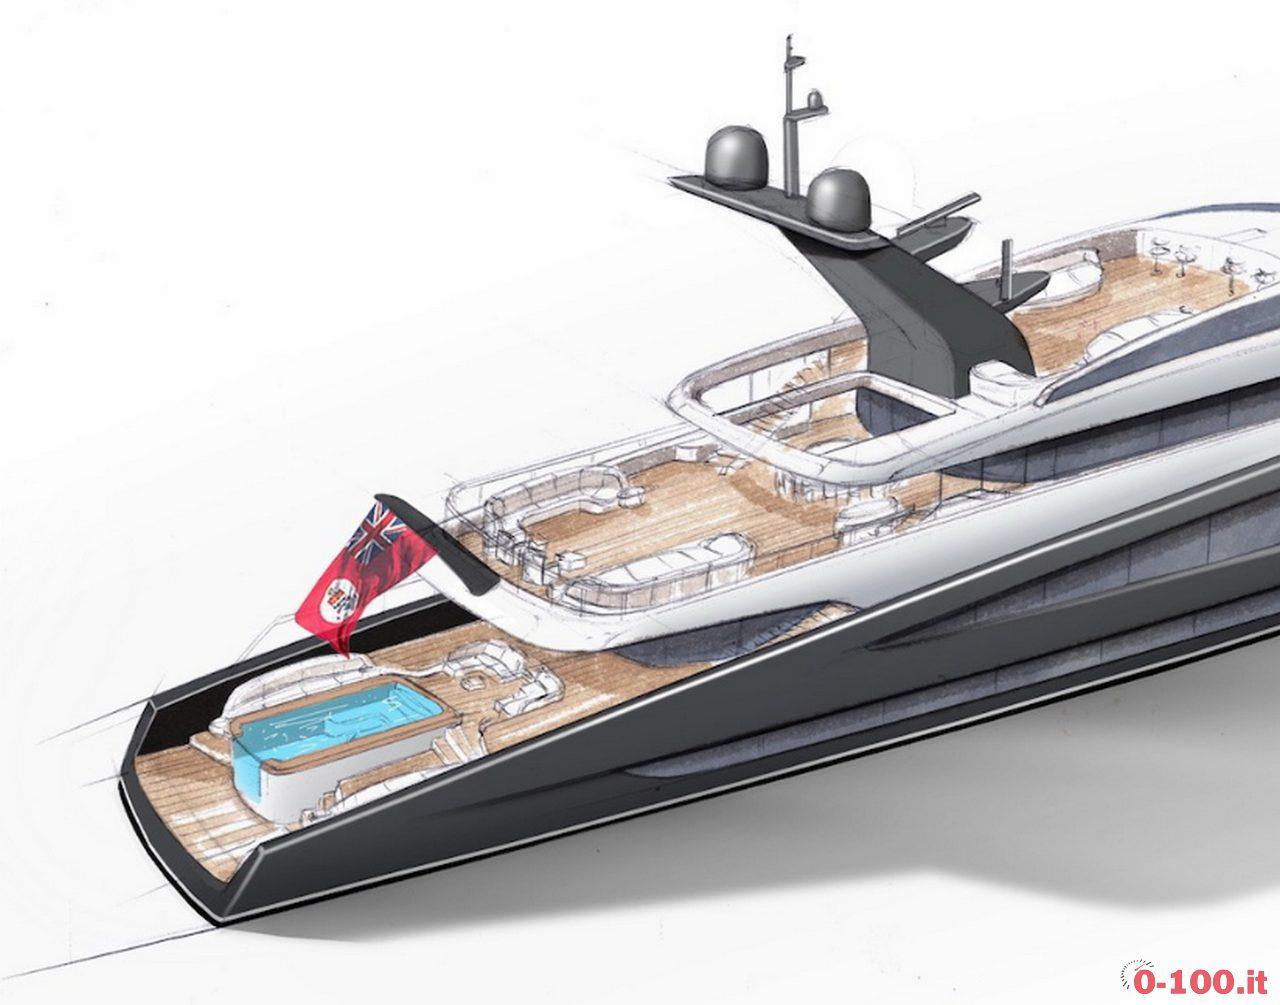 royal-huisman-65m-superyacht-project-dart-65_0-1004